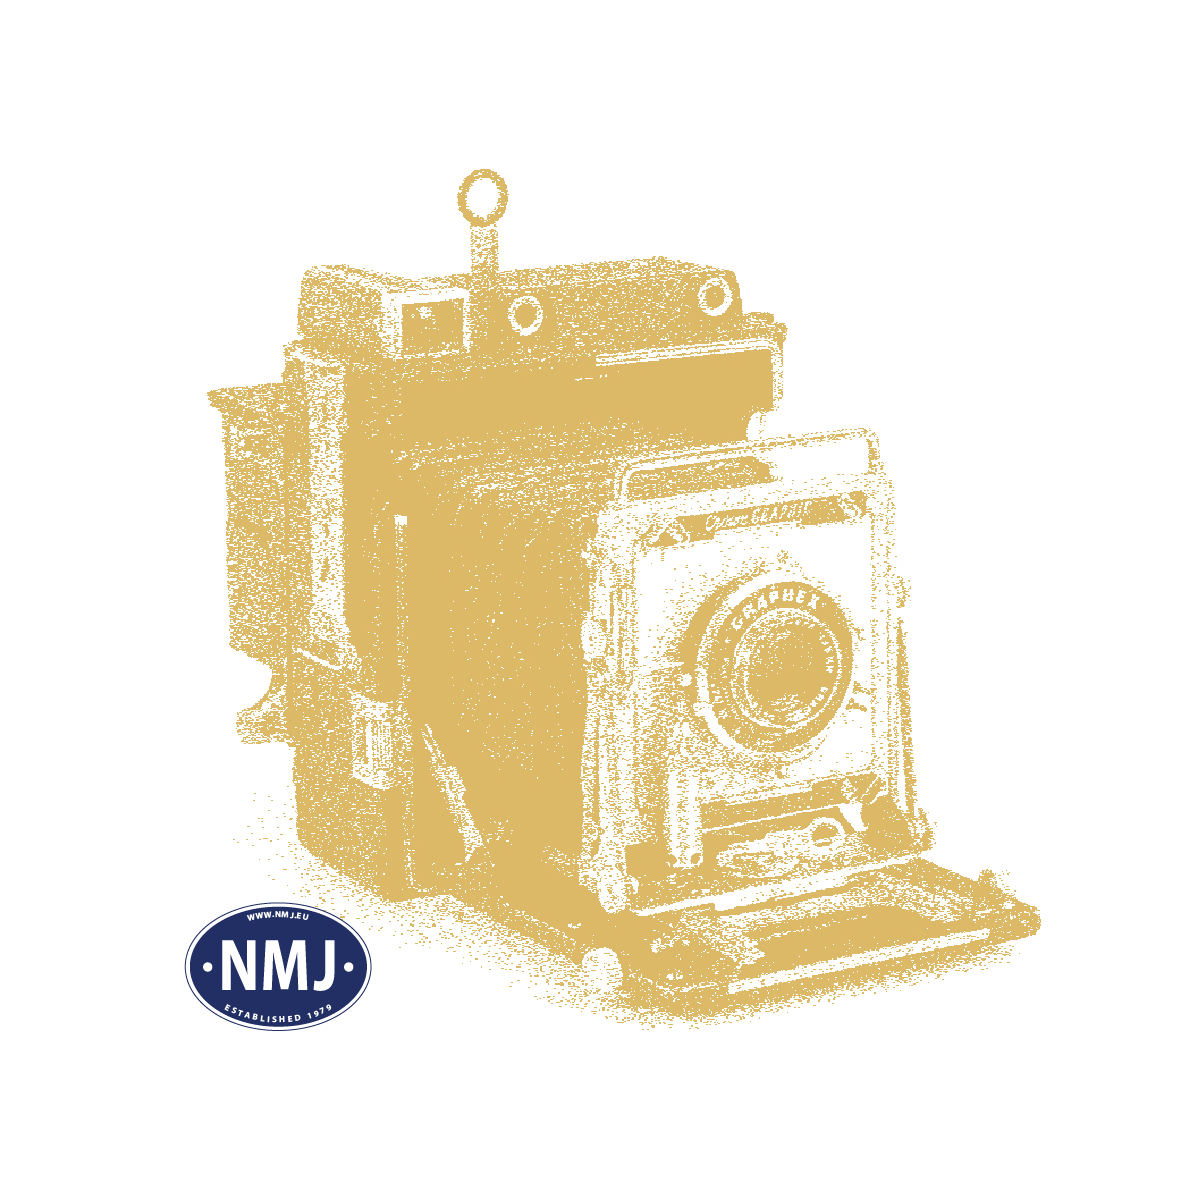 NMJT85.202 - NMJ Topline CargoNet Di8.707, DCC m/ Lyd